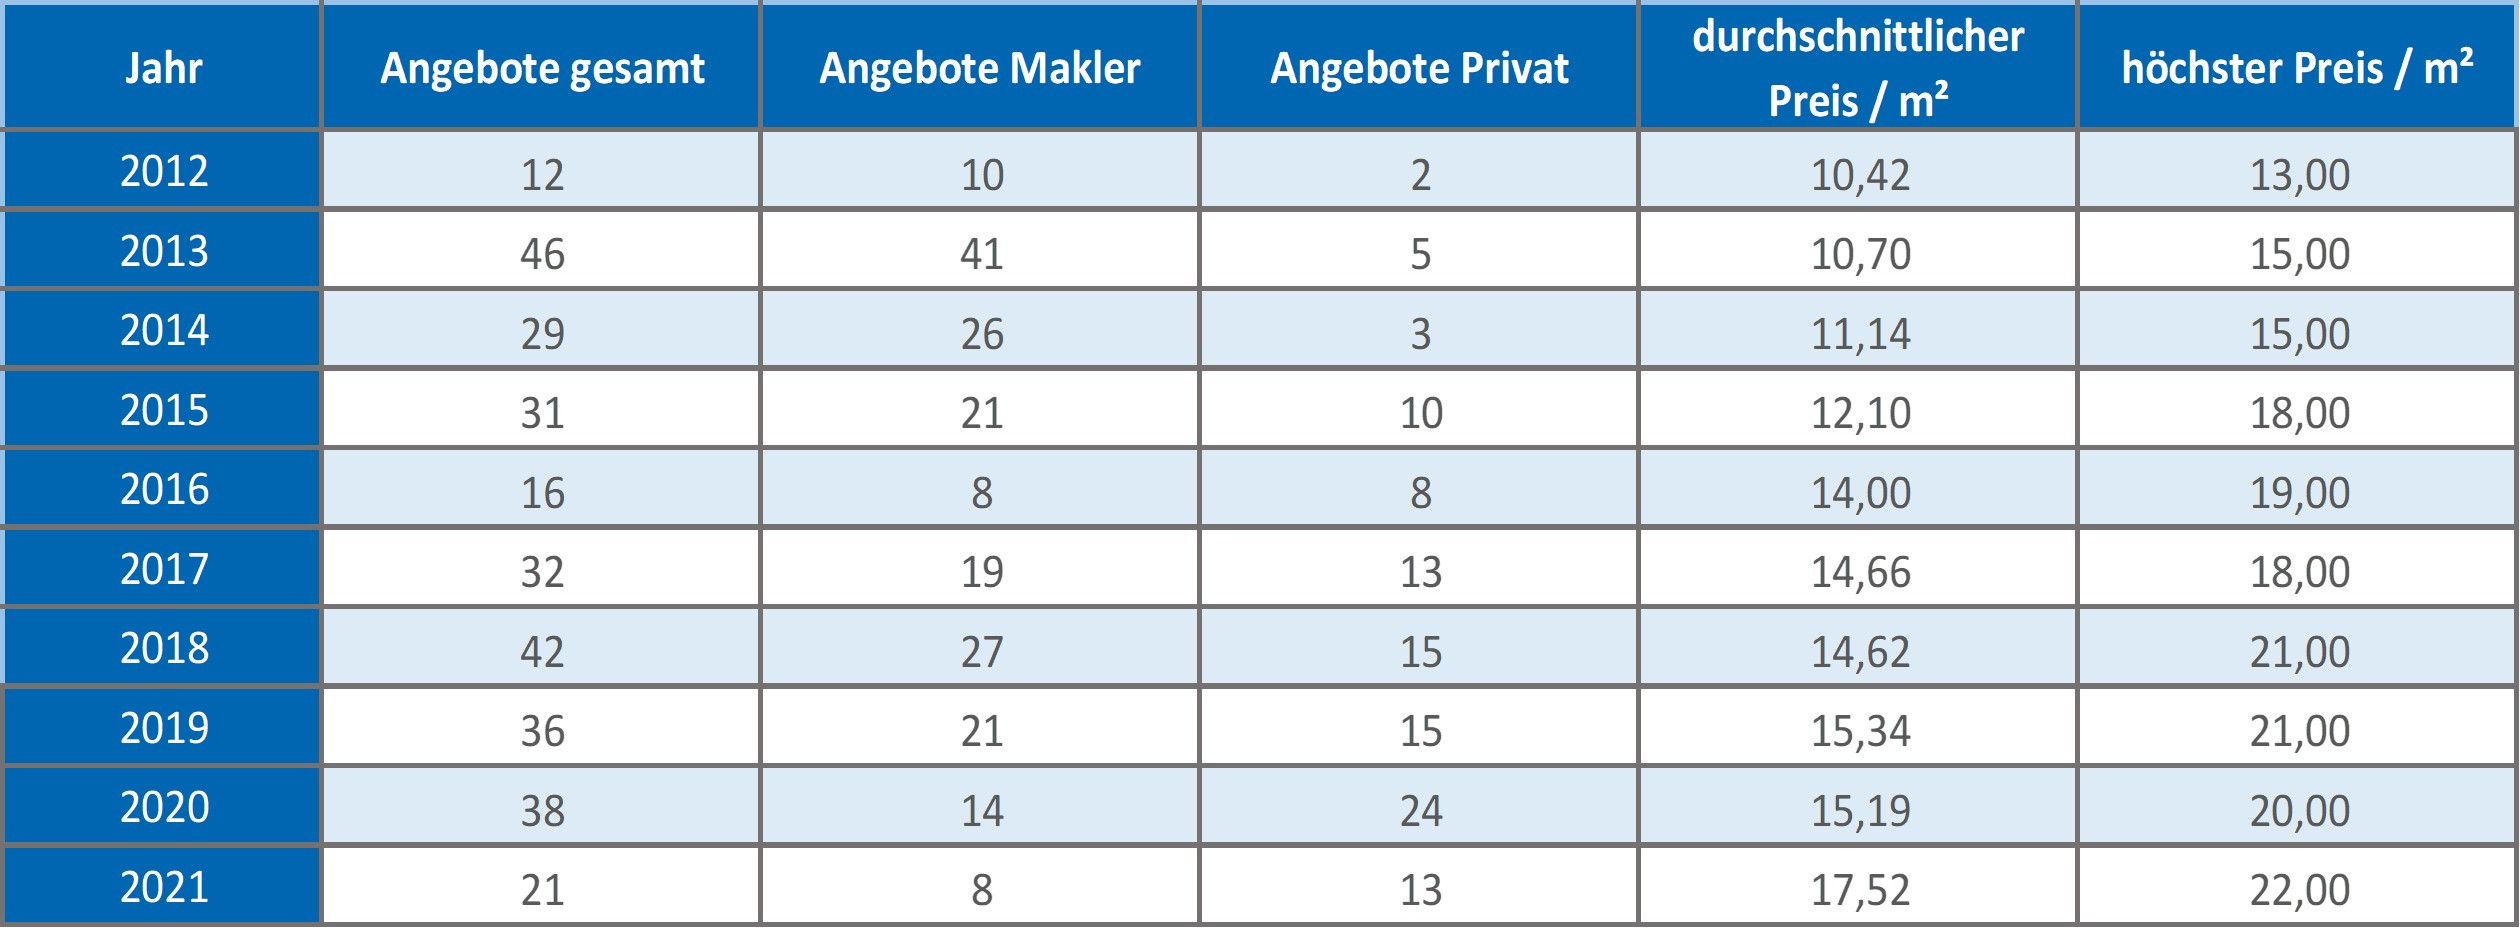 Aschheim Makler Wohnung mieten vermieten Preis Bewertung 2019, 2020, 2021